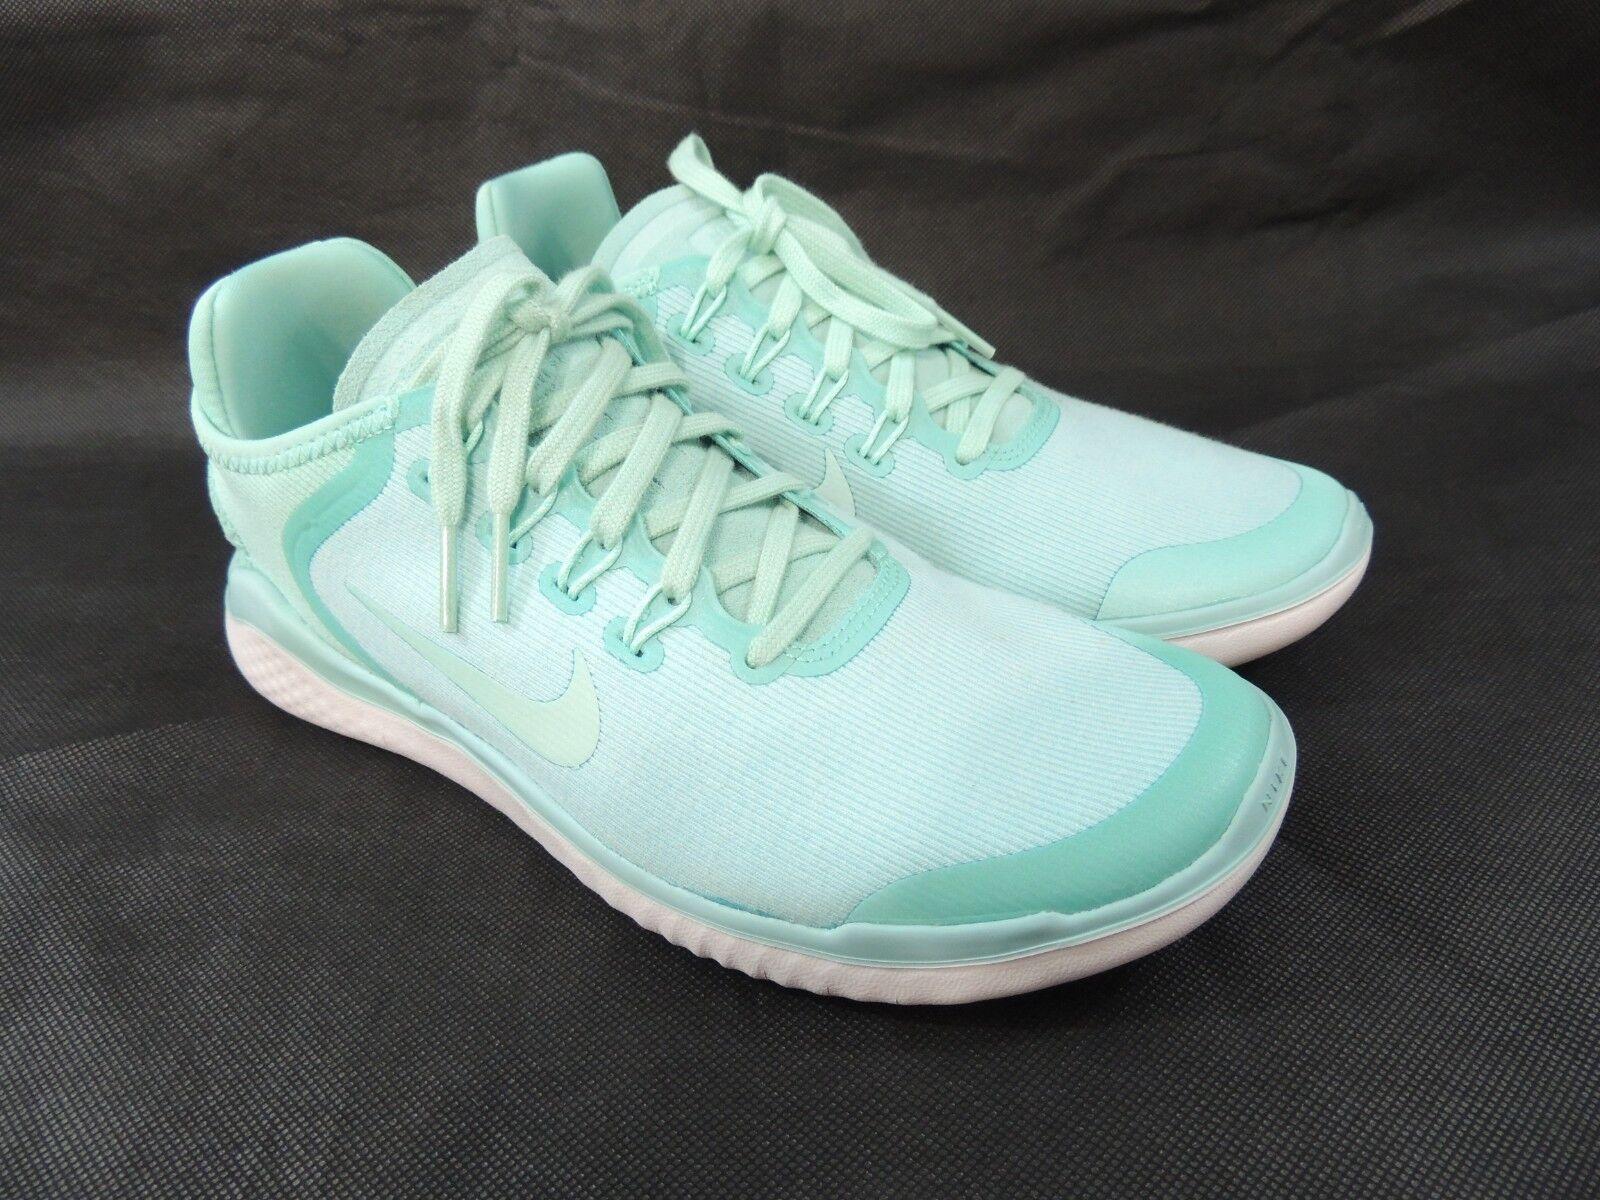 bd7182ba4f672 Nike RN 2018 Sun Women s Running Shoes Size 8 Ah5208 300 for sale ...